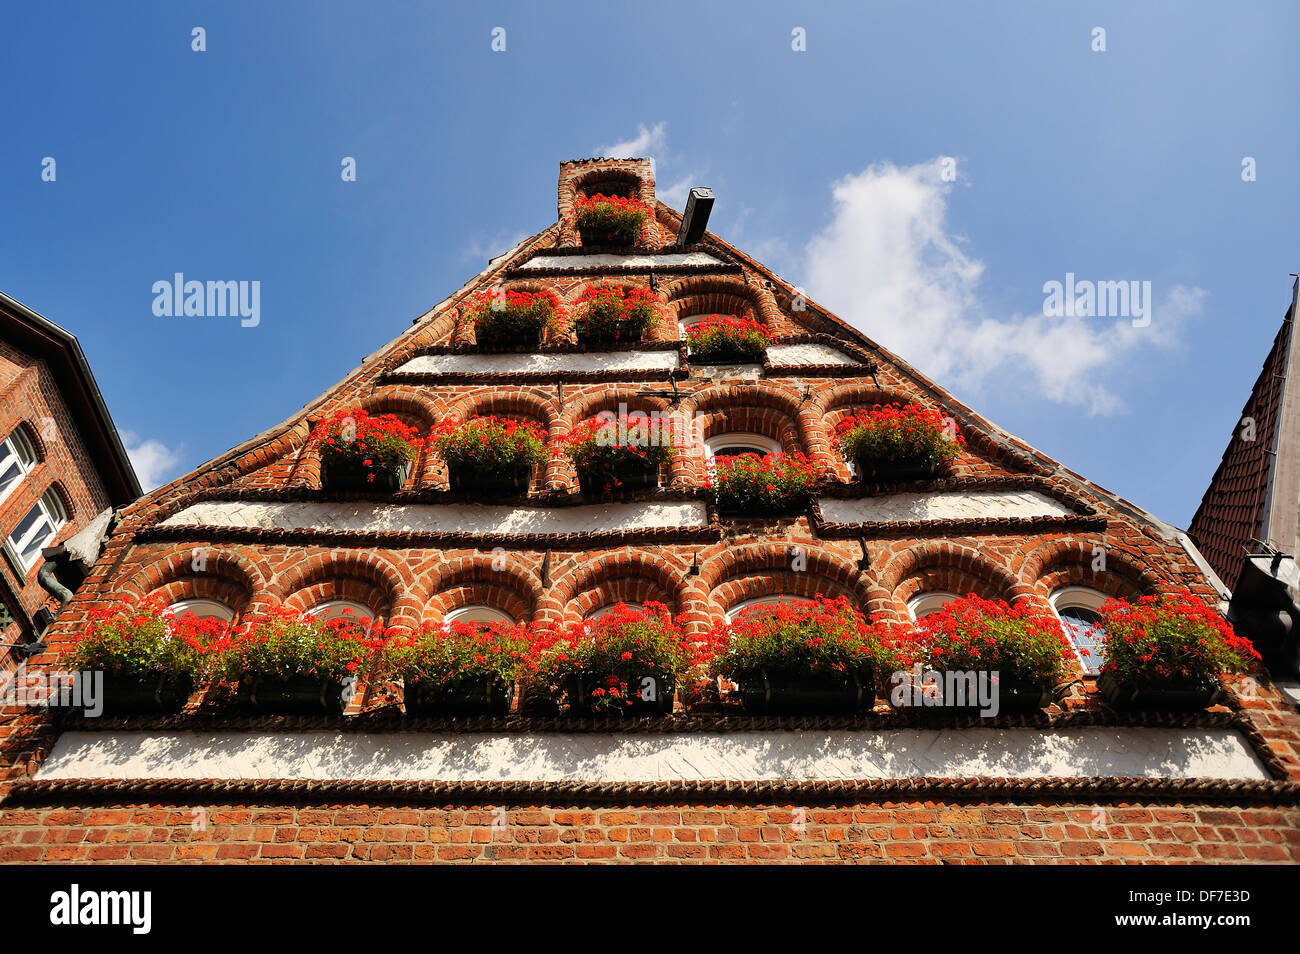 Renaissance pediment with geraniums, Lüneburg, Lower Saxony, Germany - Stock Image